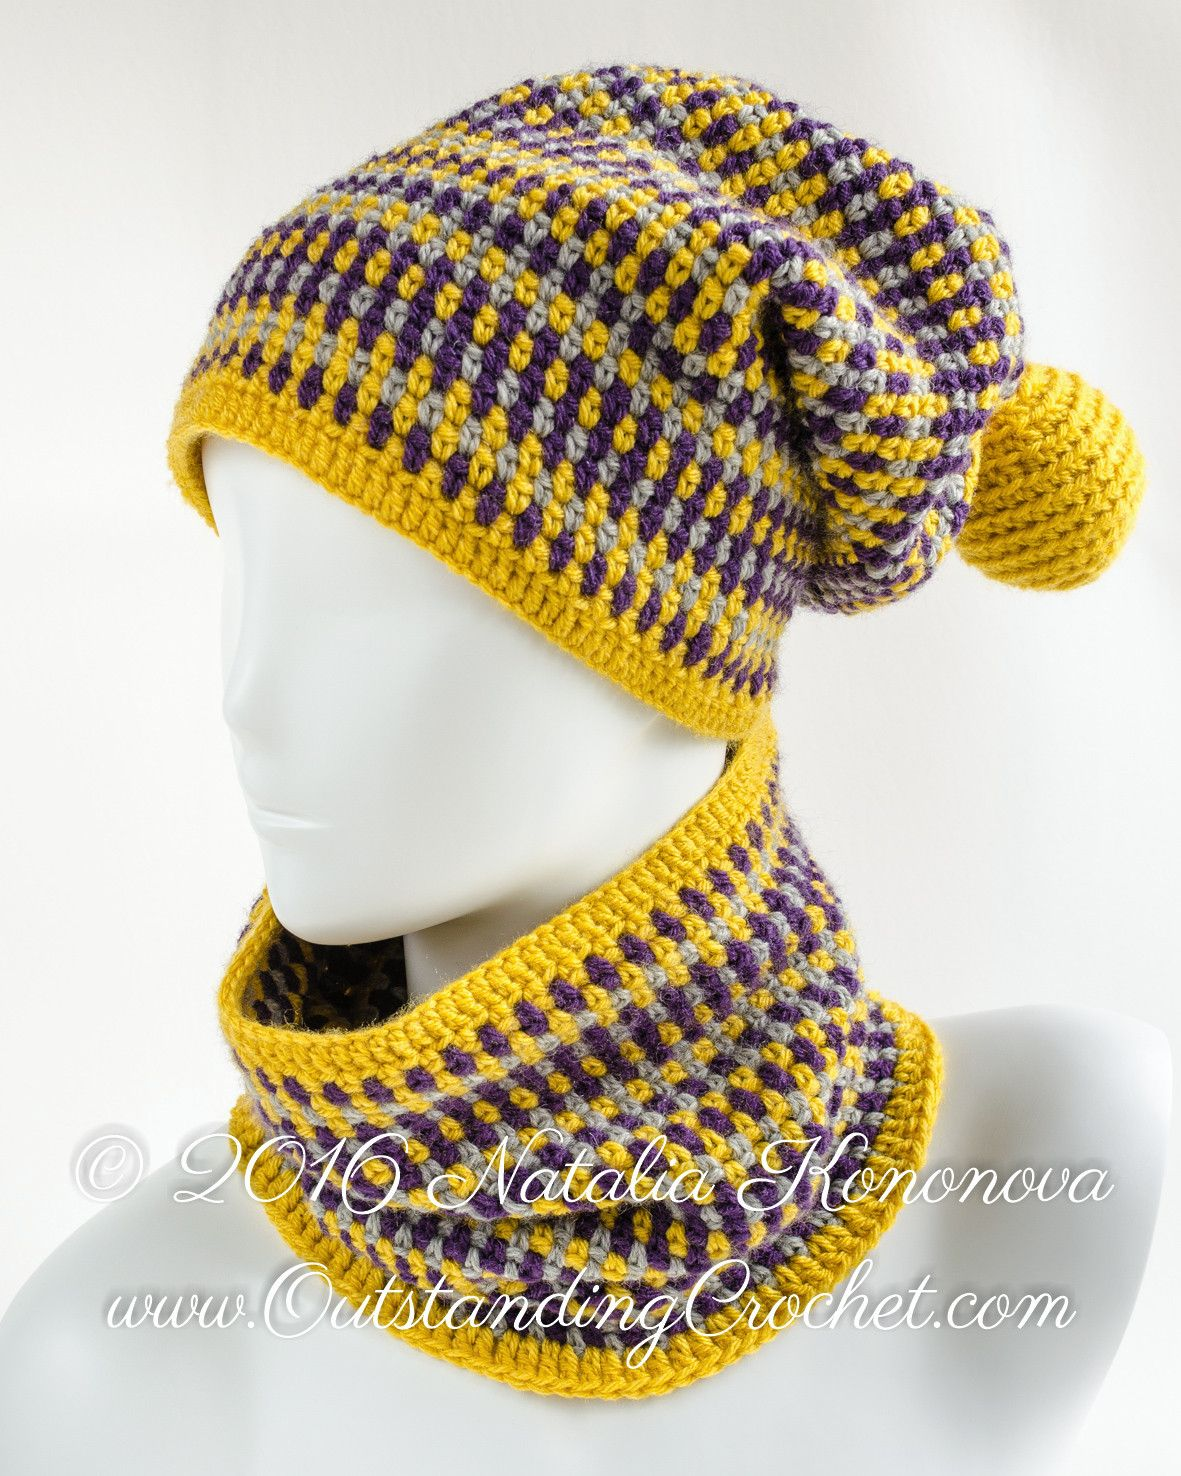 Crochet patterns from head to toes be designer Natalia Kononova at ...